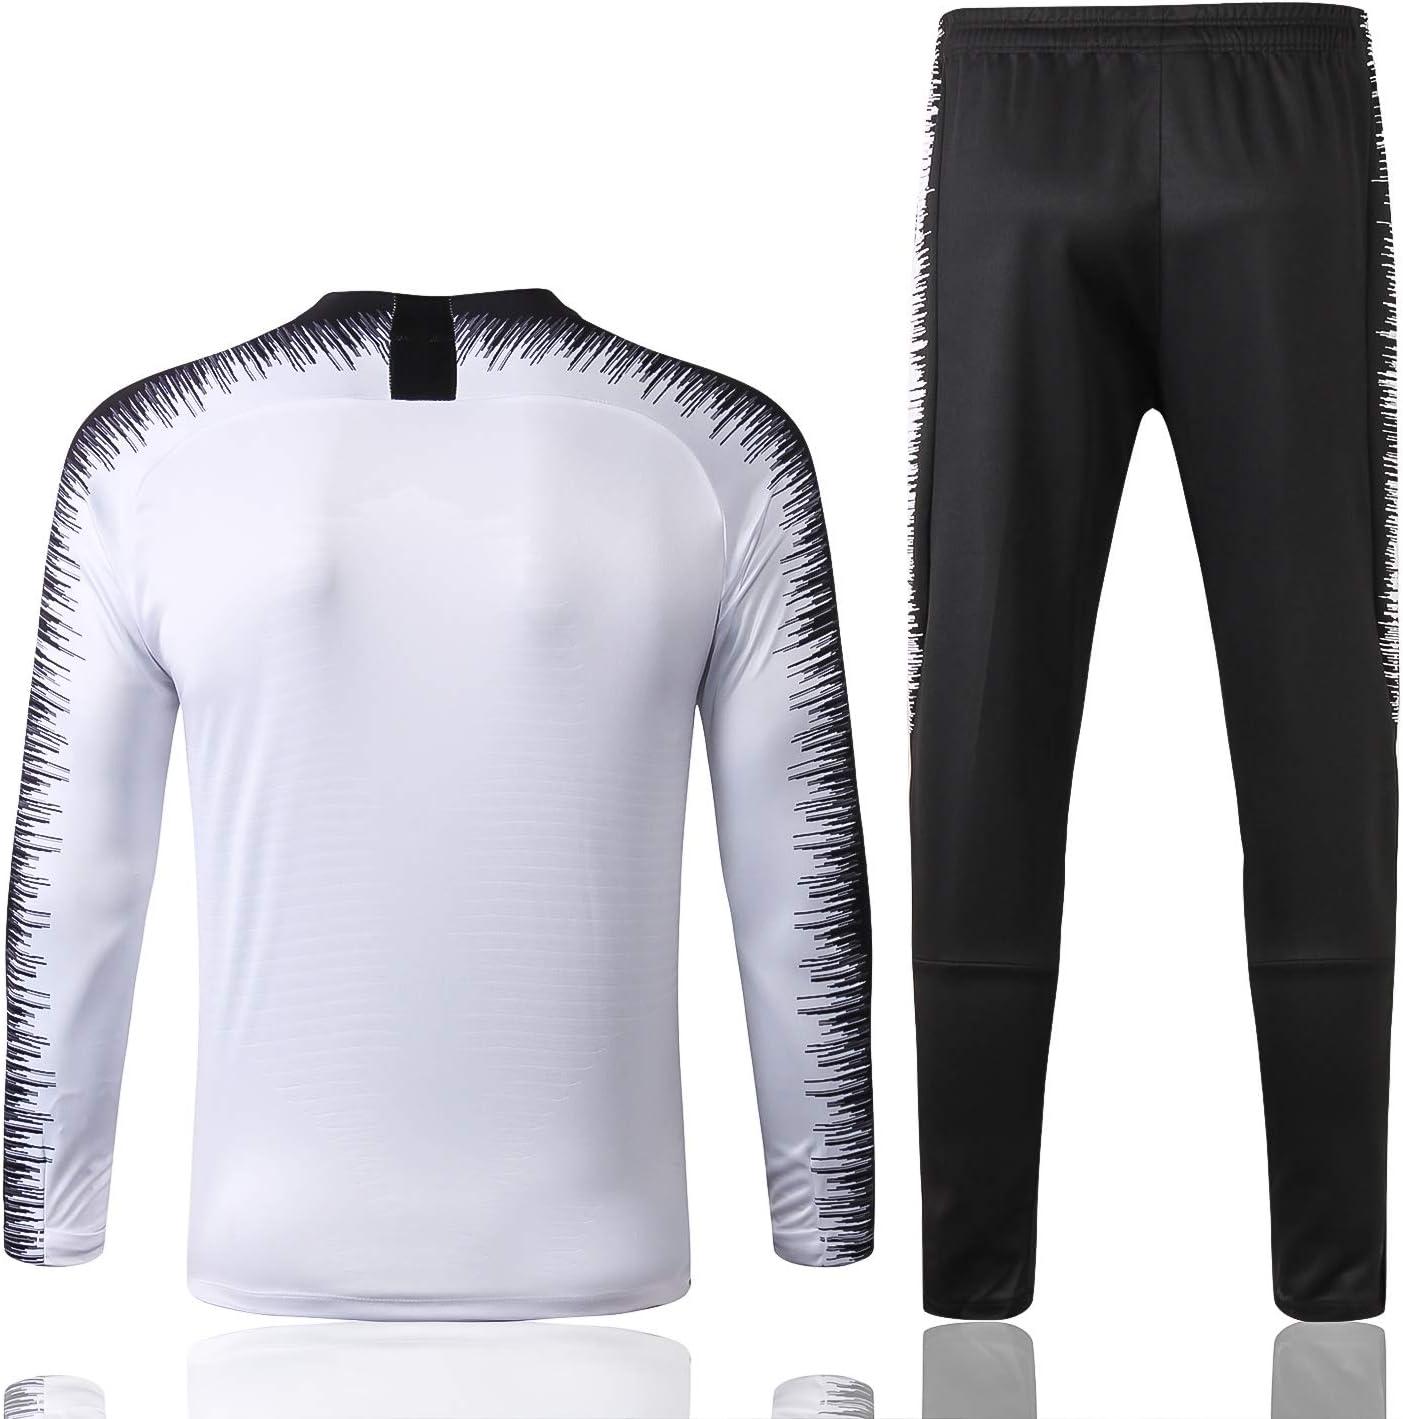 No-brand Palestine Football Club de Sport Blanc /à Manches Longues Respirant Football Formation V/êtements-dd091